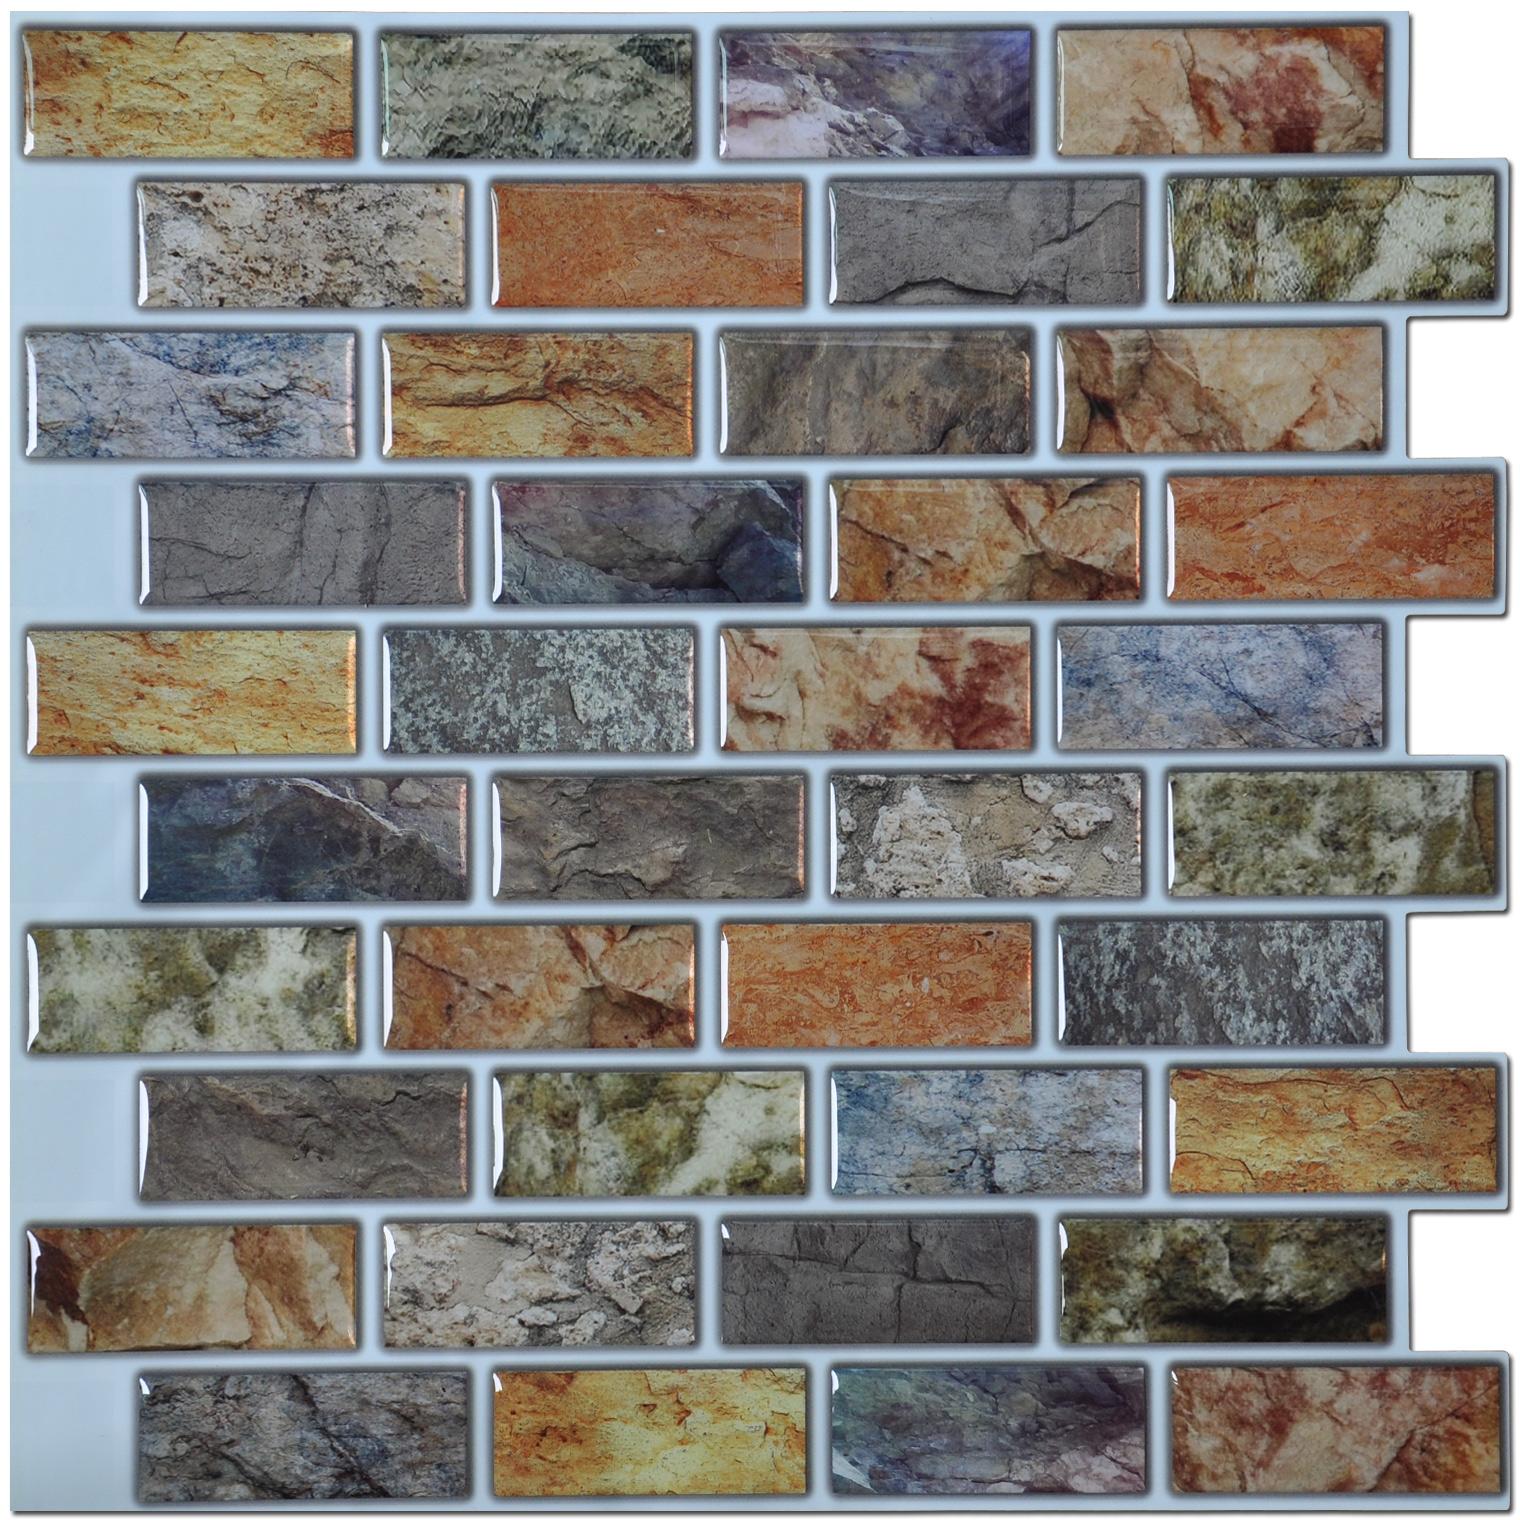 "Art3d 12"" x 12"" Peel and Stick Backsplash Tiles, 6 Pcs Smart Tile Backsplash for Kitchen"